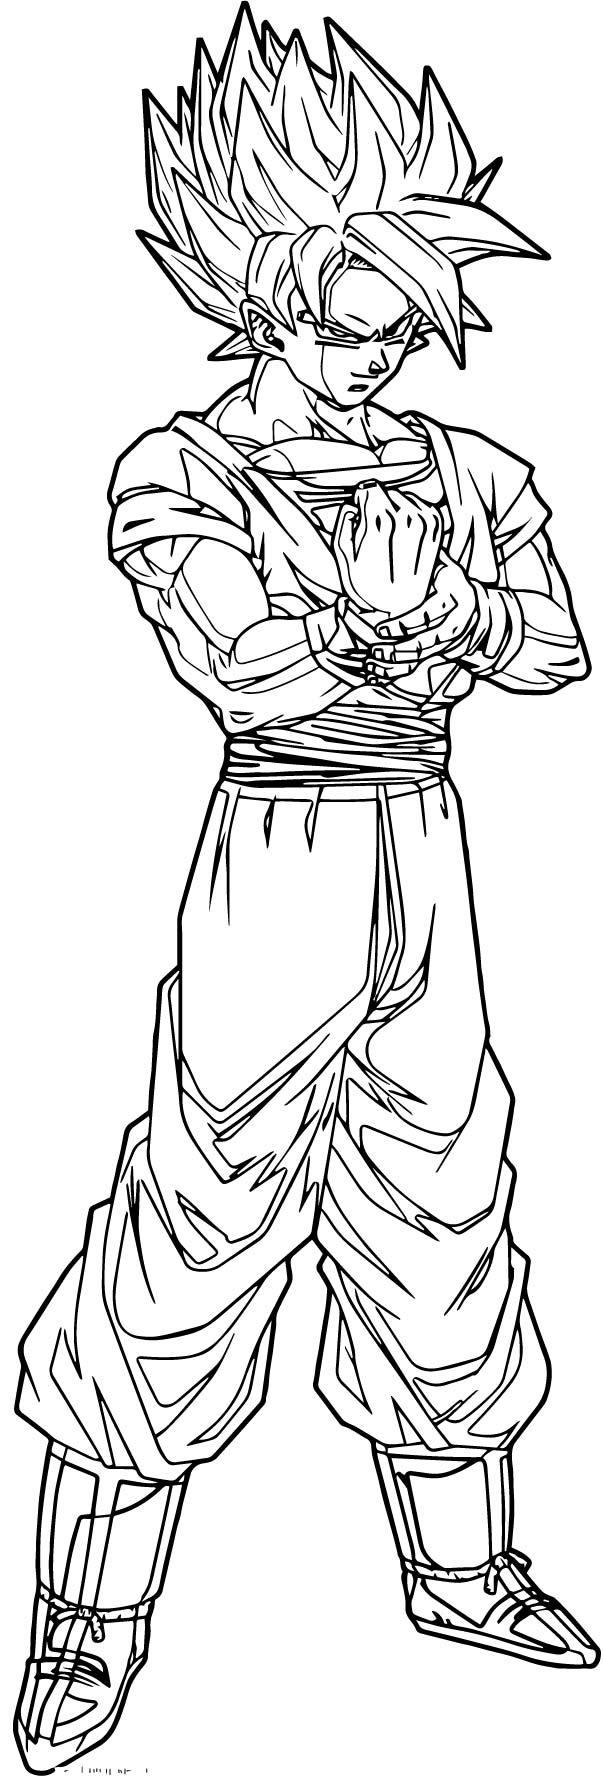 Goku We Coloring Page 214